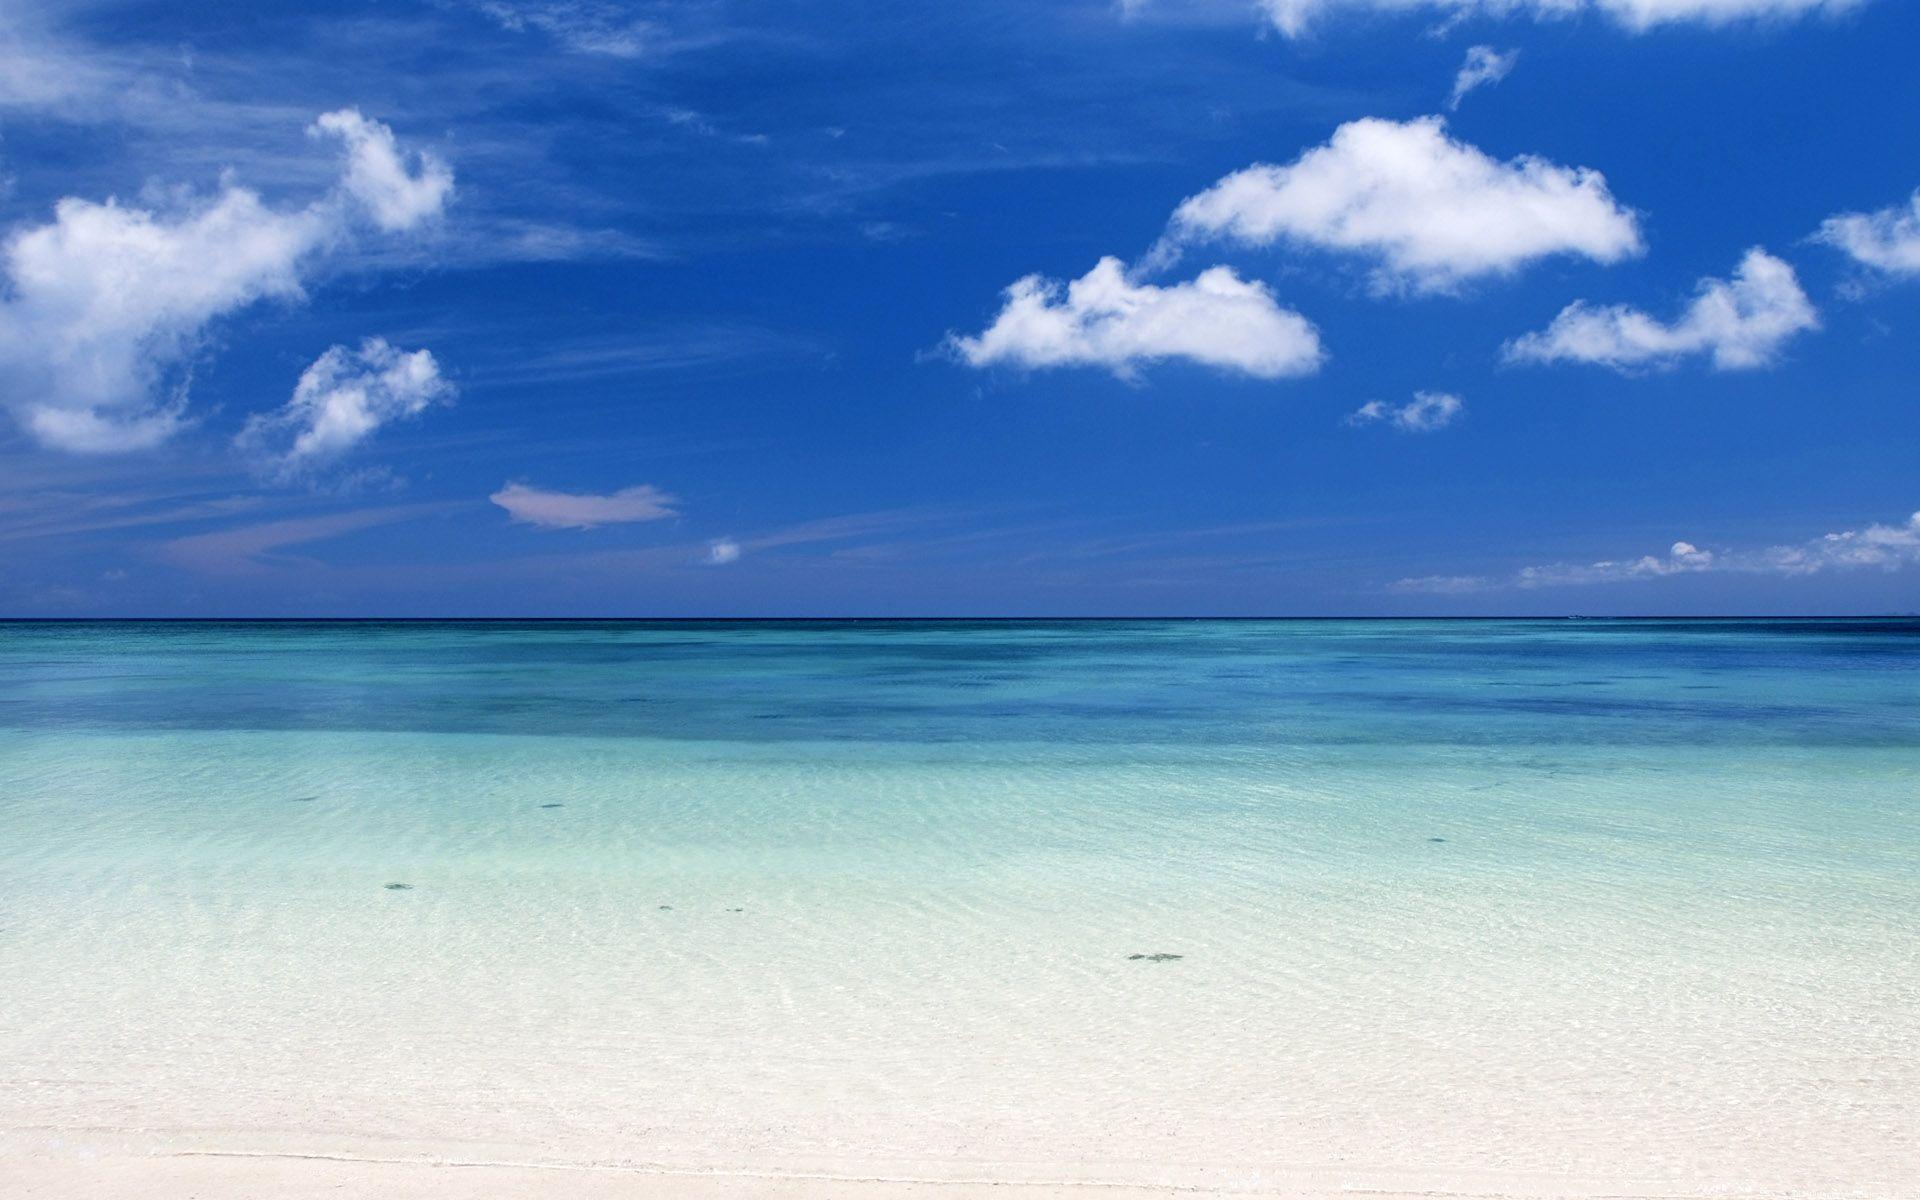 Beautiful Caribbean Beach High Resolution Windows 8 Wallpaper HD 1920x1200